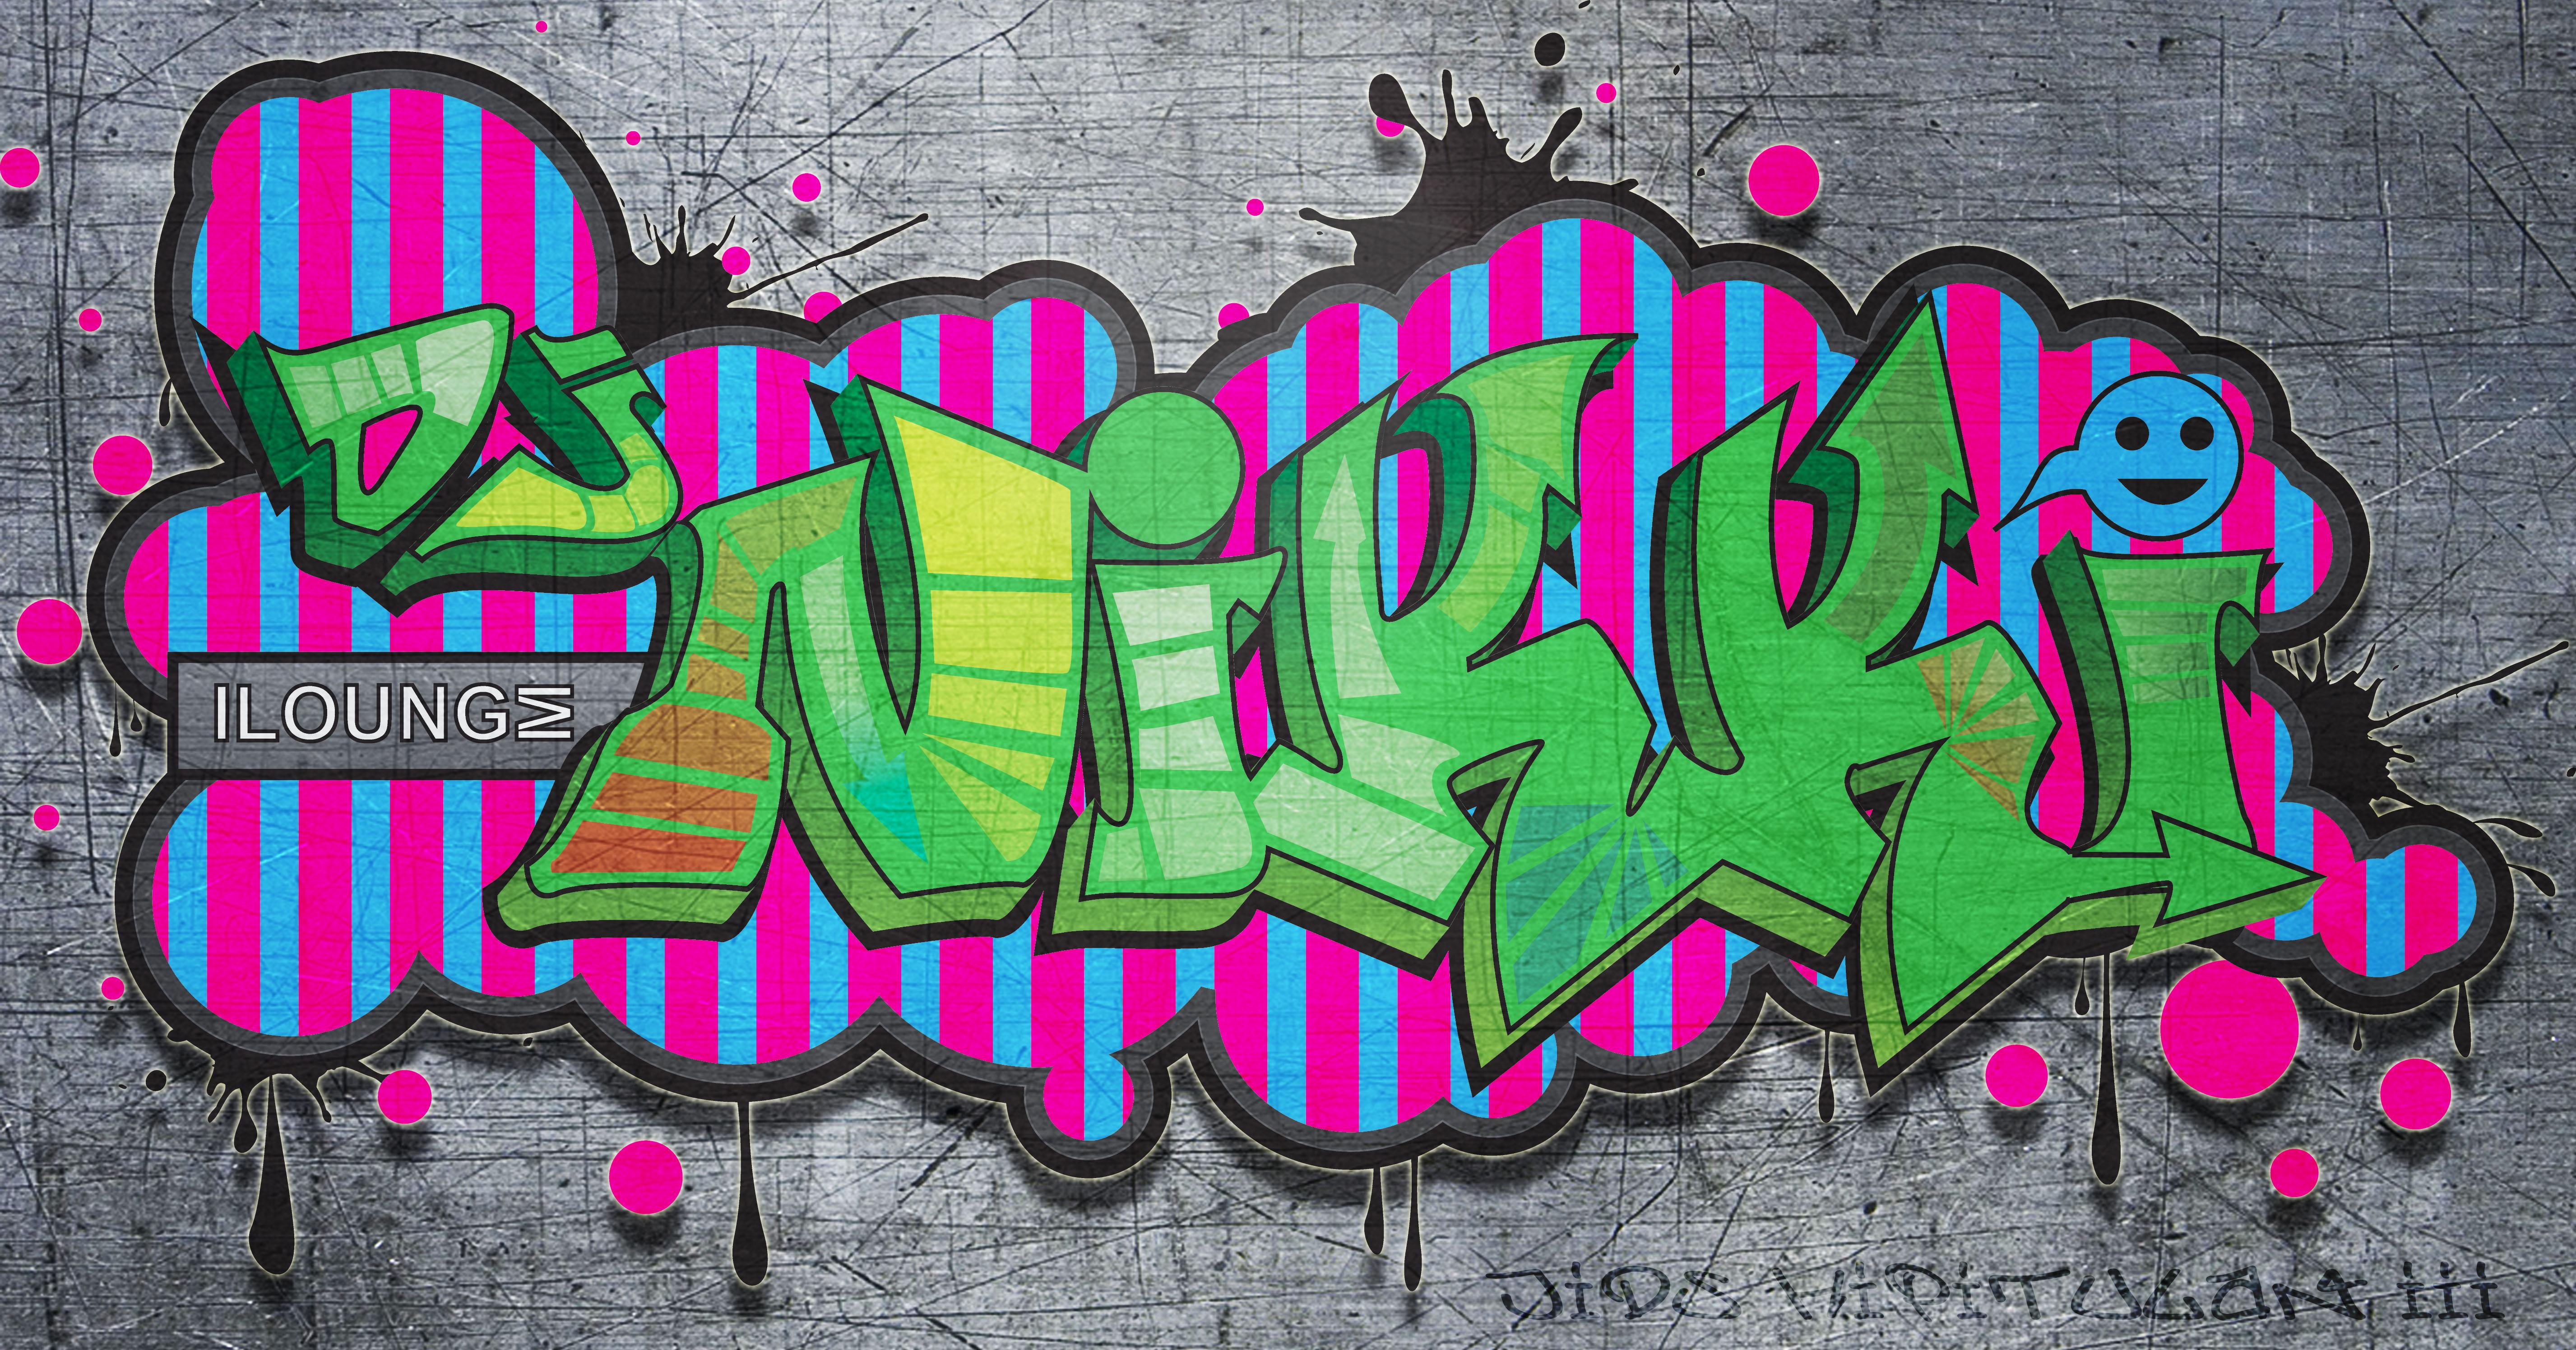 Graffiti by jids homeworks on deviantart - Graffiti simple ...